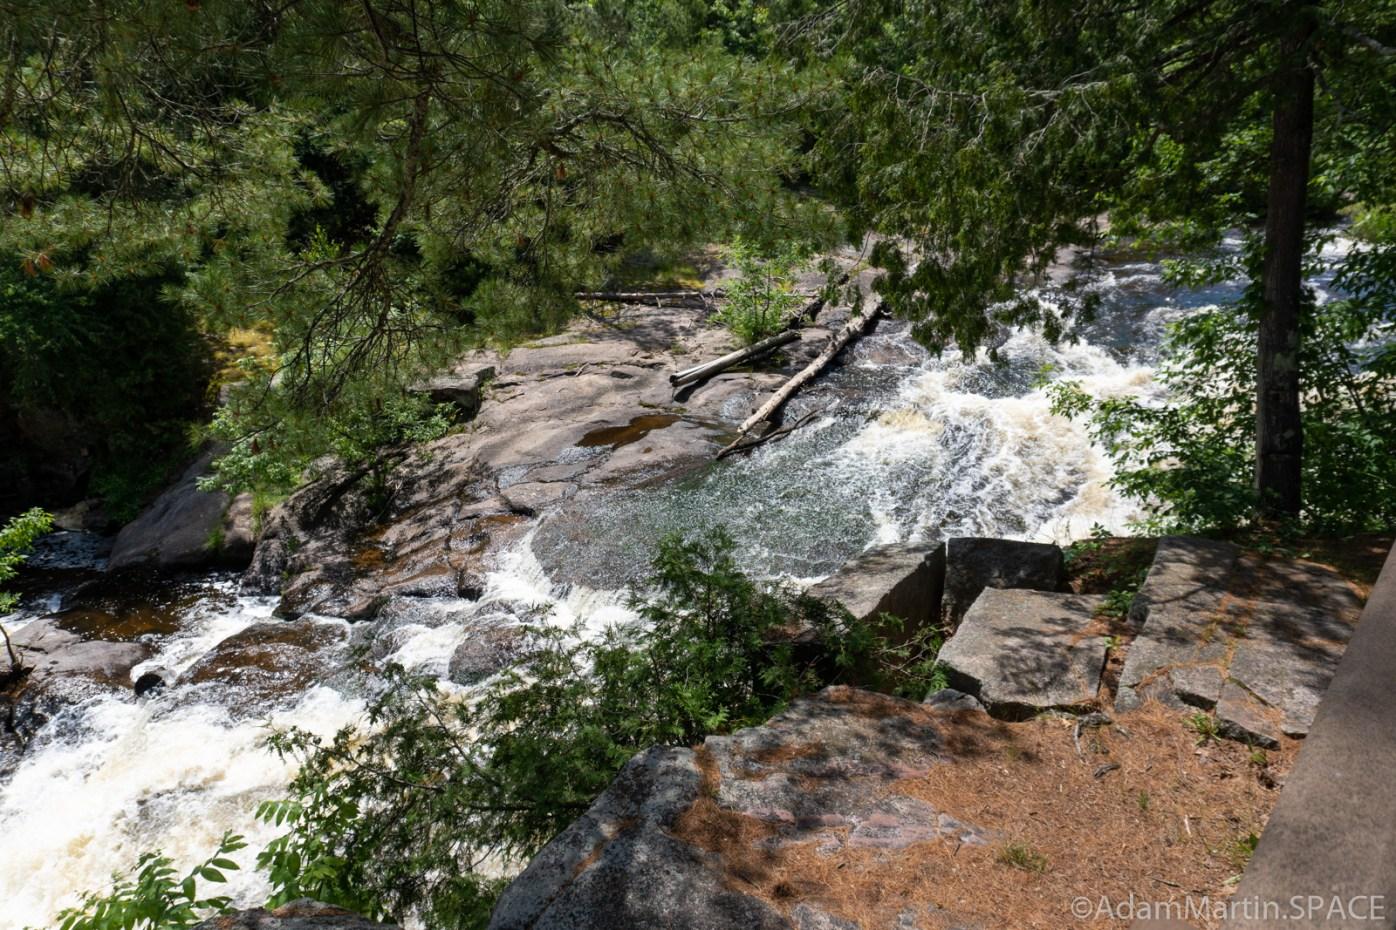 Big Smokey Falls - View of 2nd large falls through trees